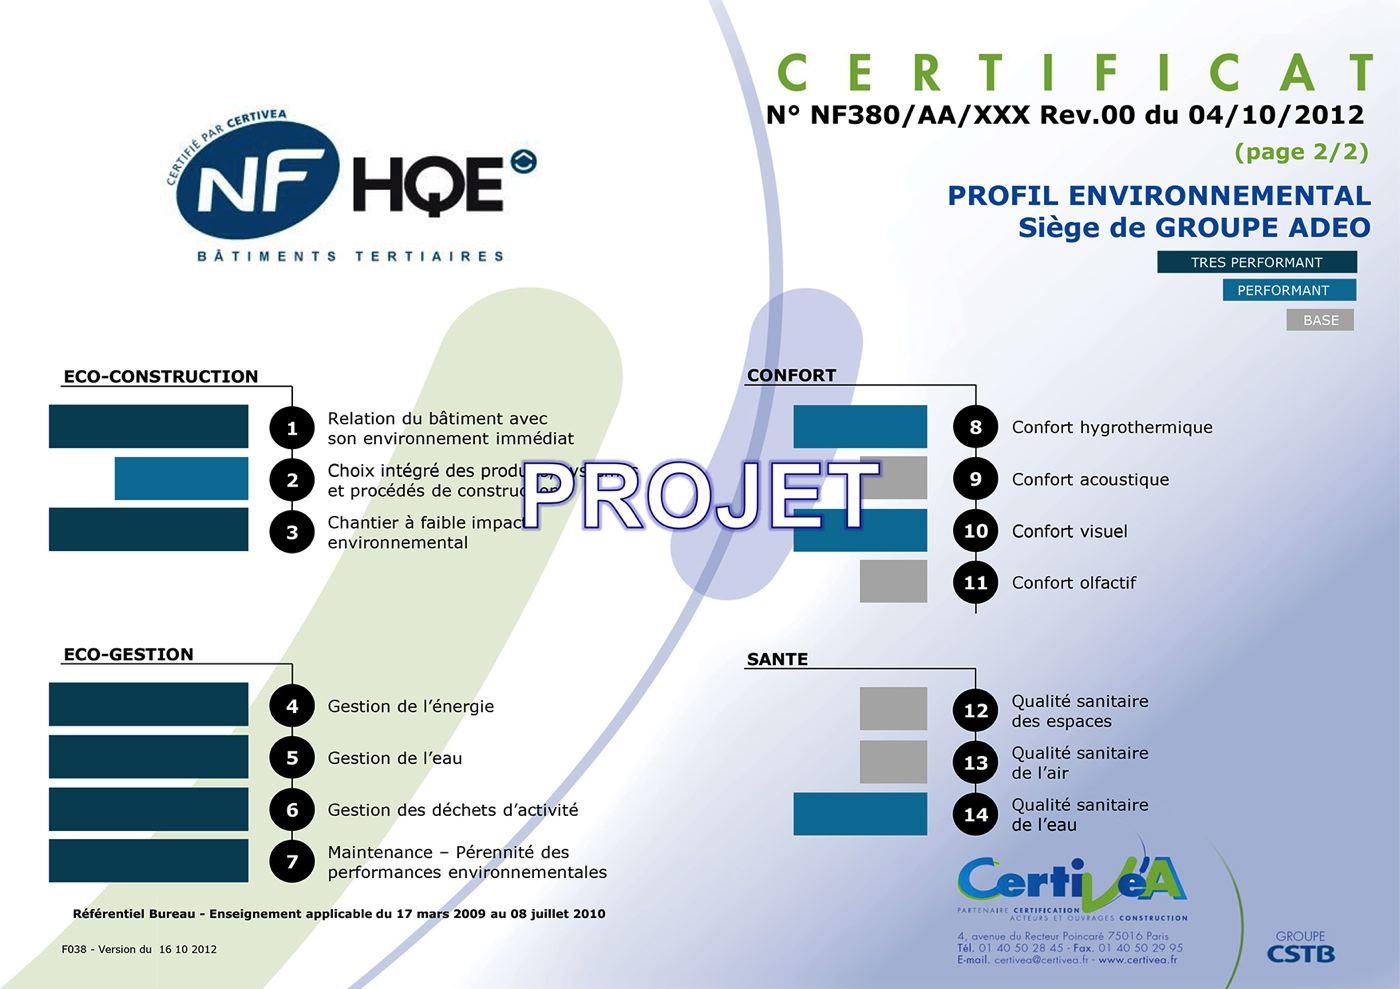 adeo_Certificat dÇf_phase R-2.jpg